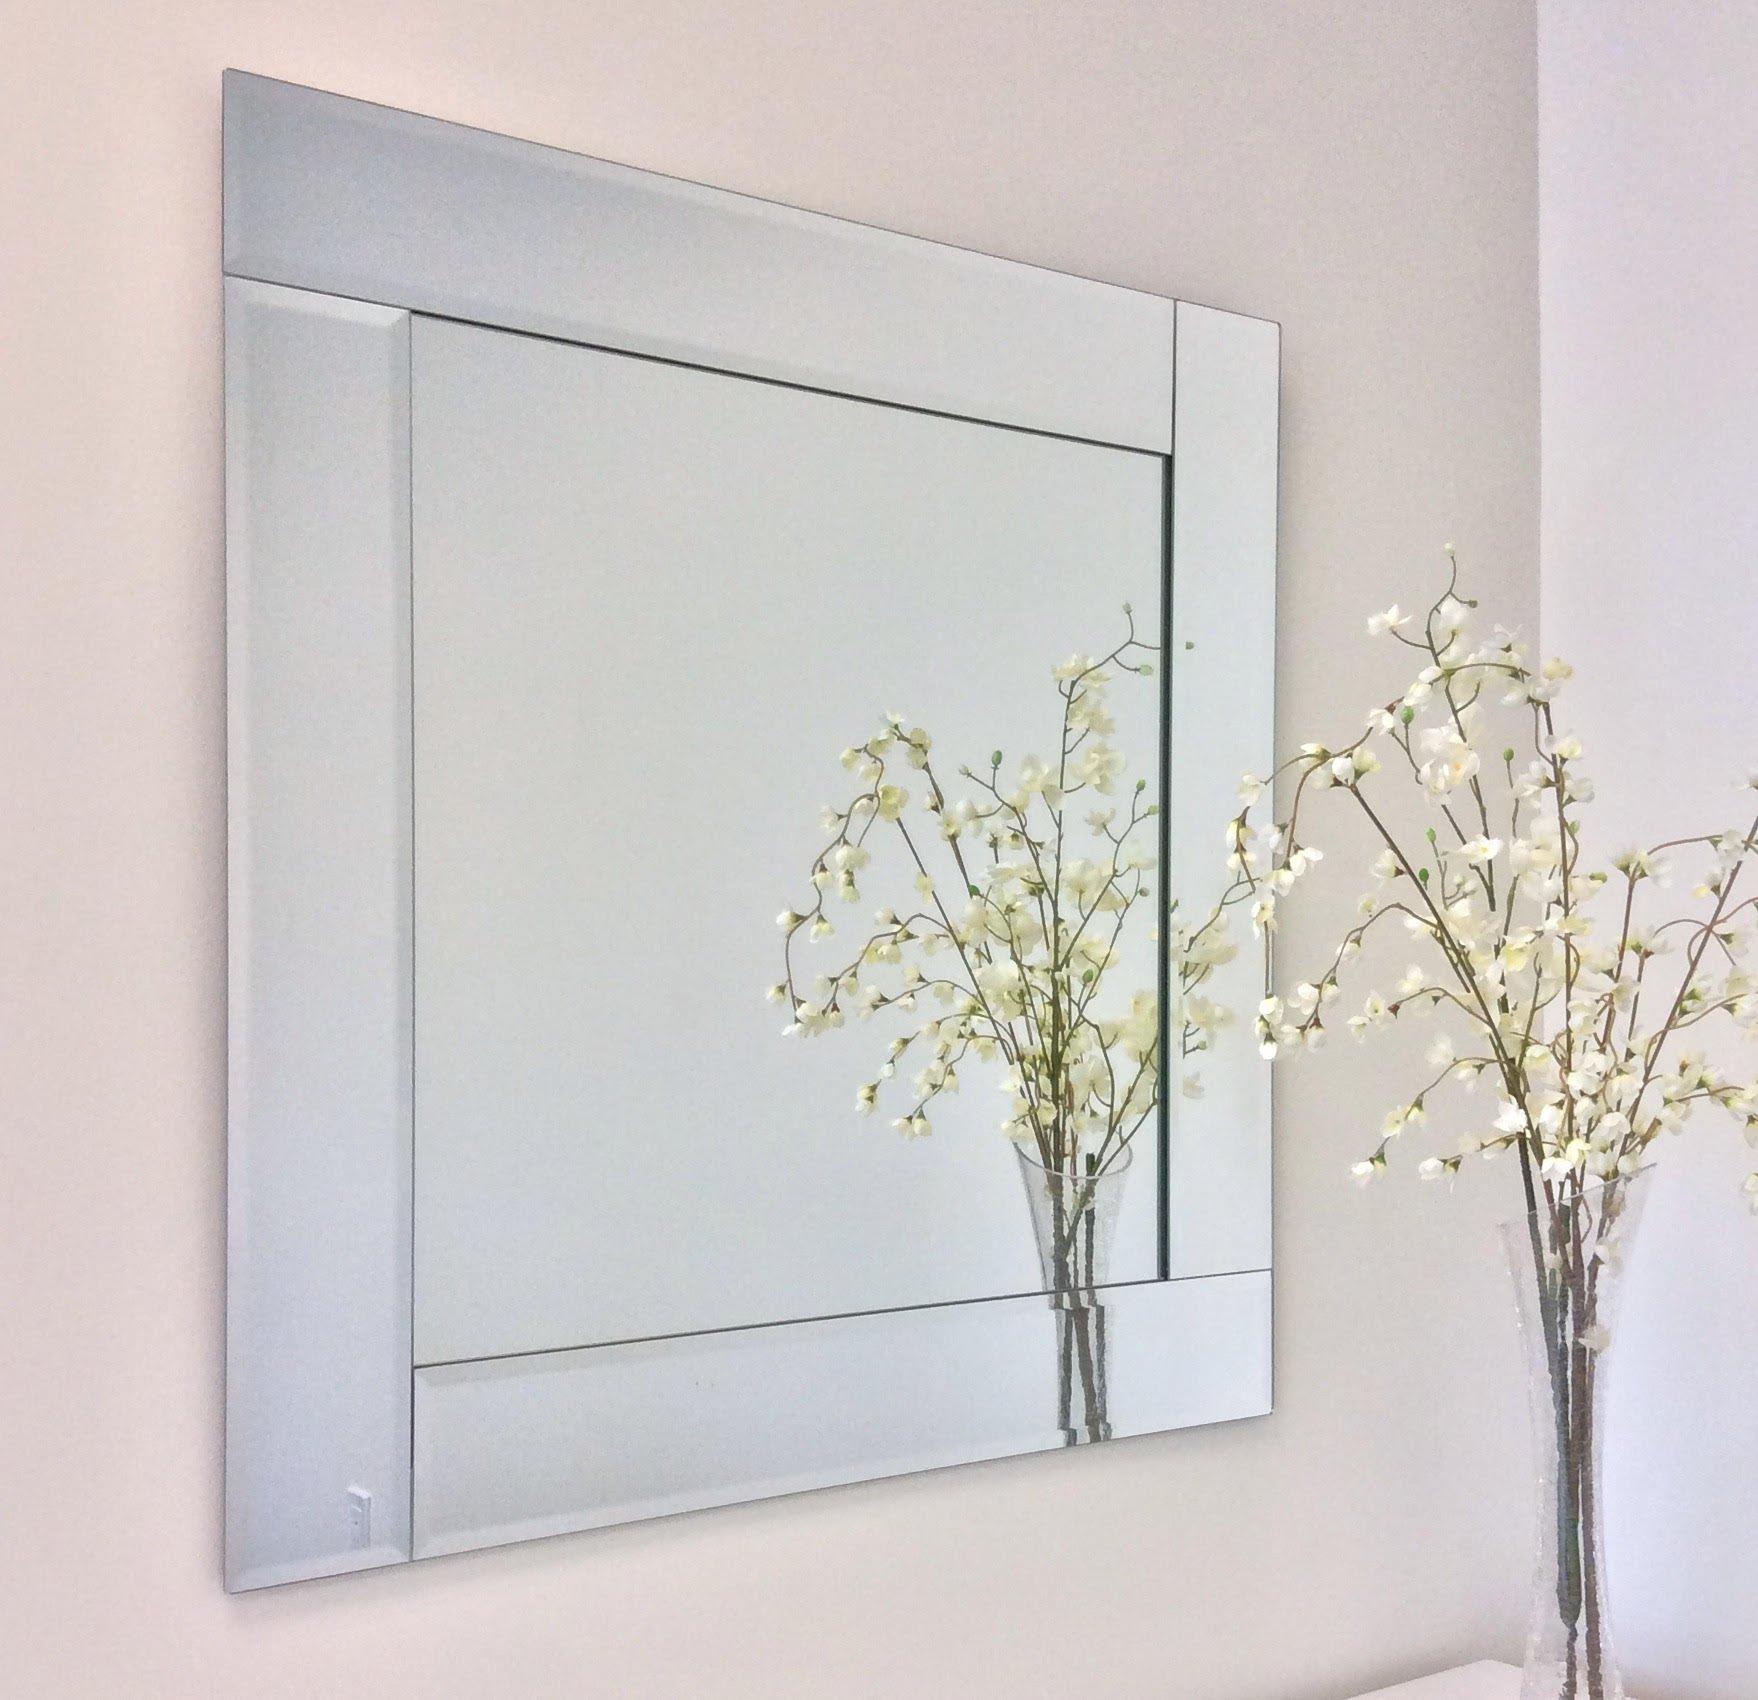 30'' Square Bevel Trim Overlay Decorative Wall Mirror